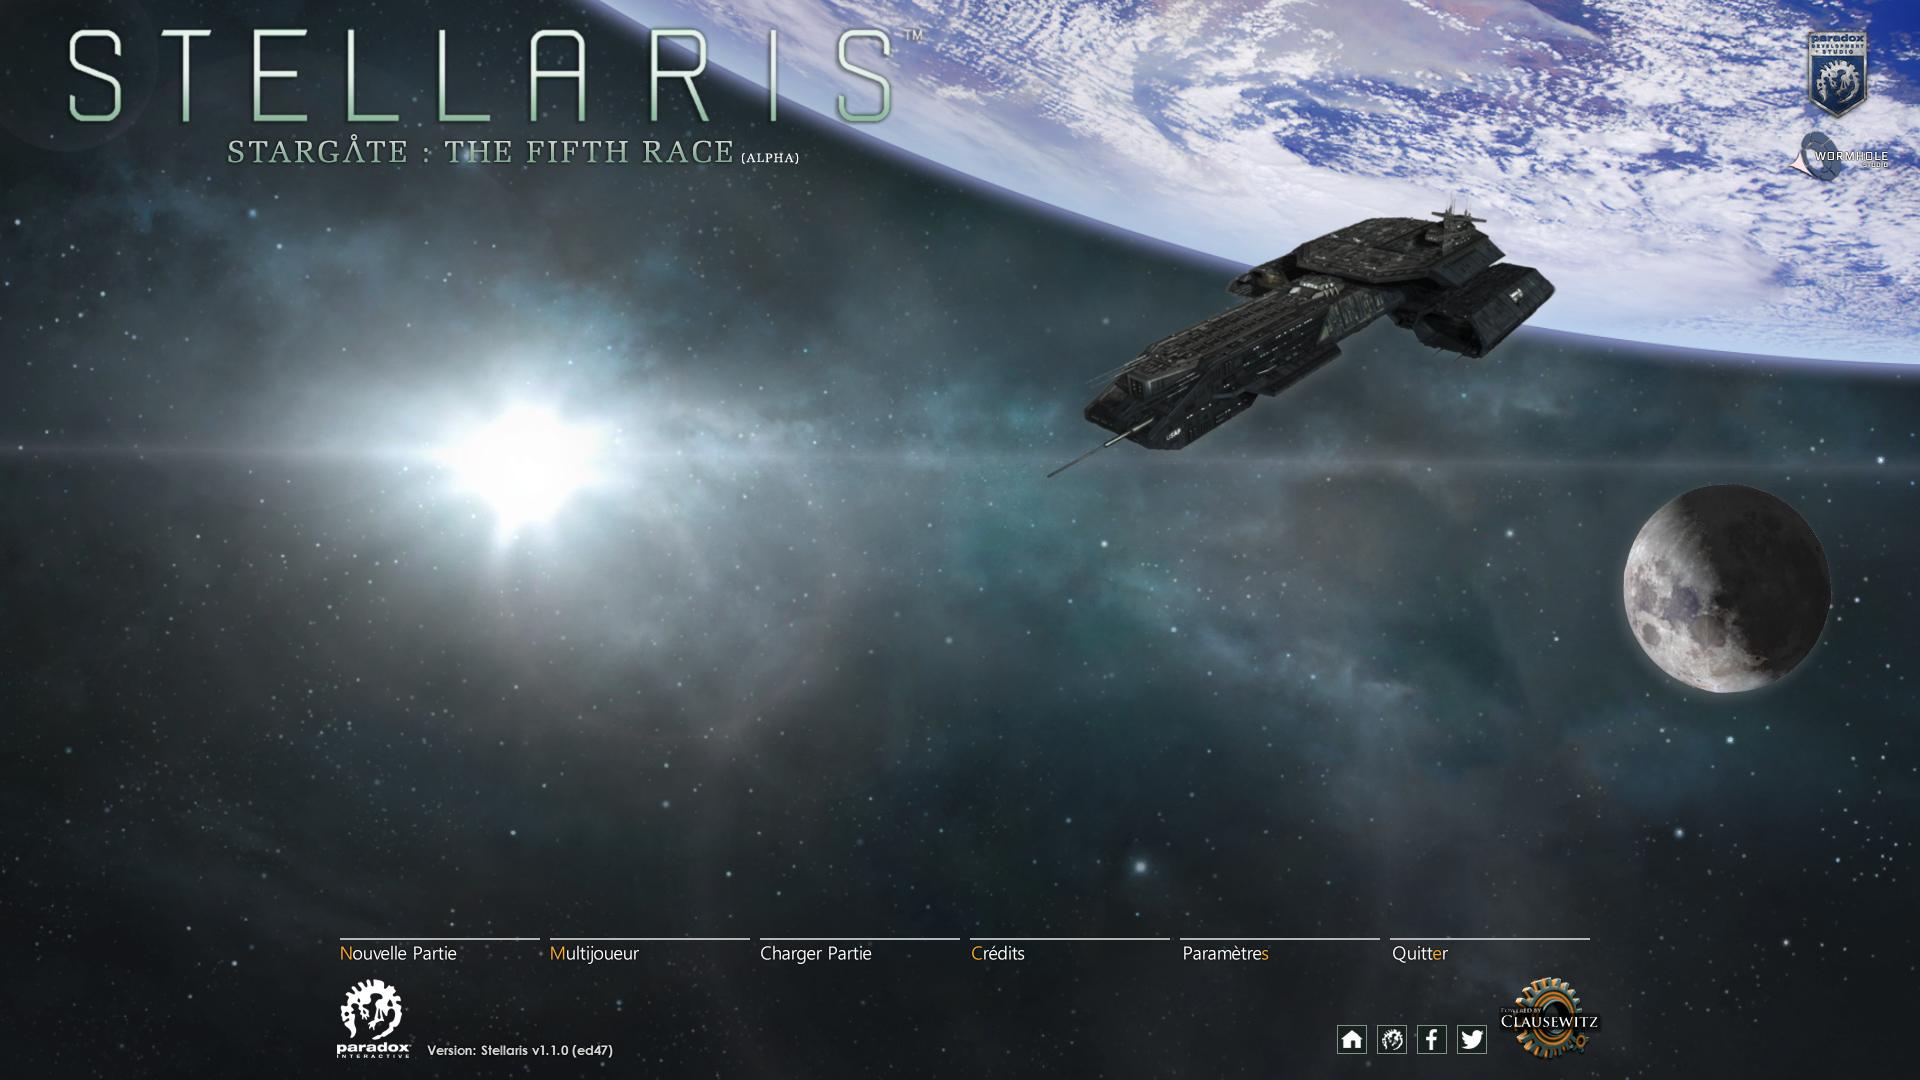 WIP] Stargate : The Fifth Race mod for Stellaris - Mod DB